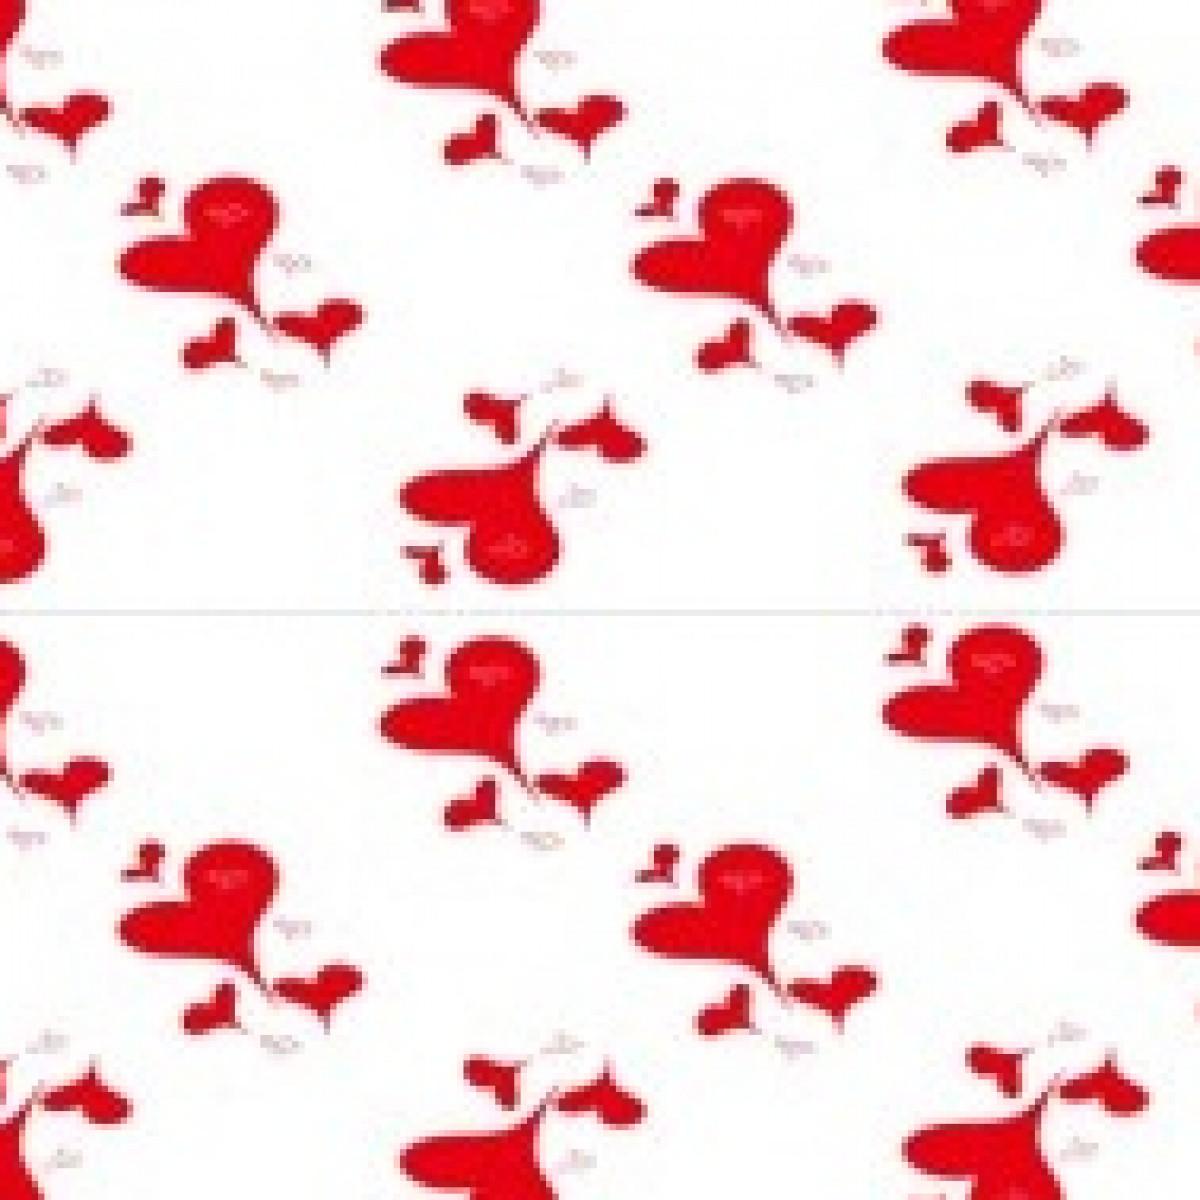 7063 Cute Hearts Red 80cmx25m 50mic Film - 1 Roll